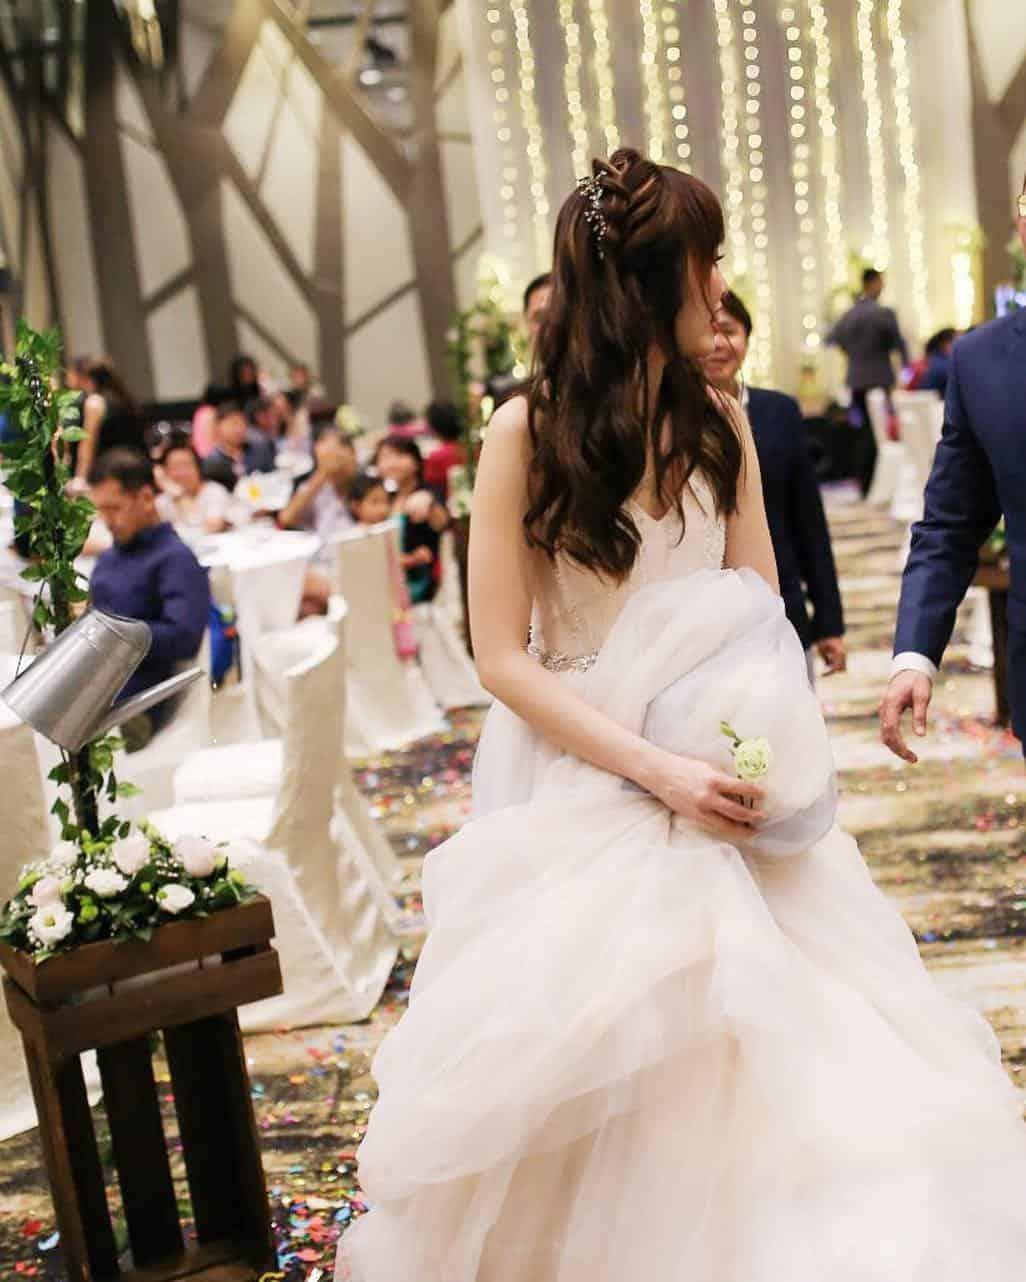 Top 12 Wedding Dresses 2020: Elegant and Exquisite Wedding Gowns 2020 (45 Photos)